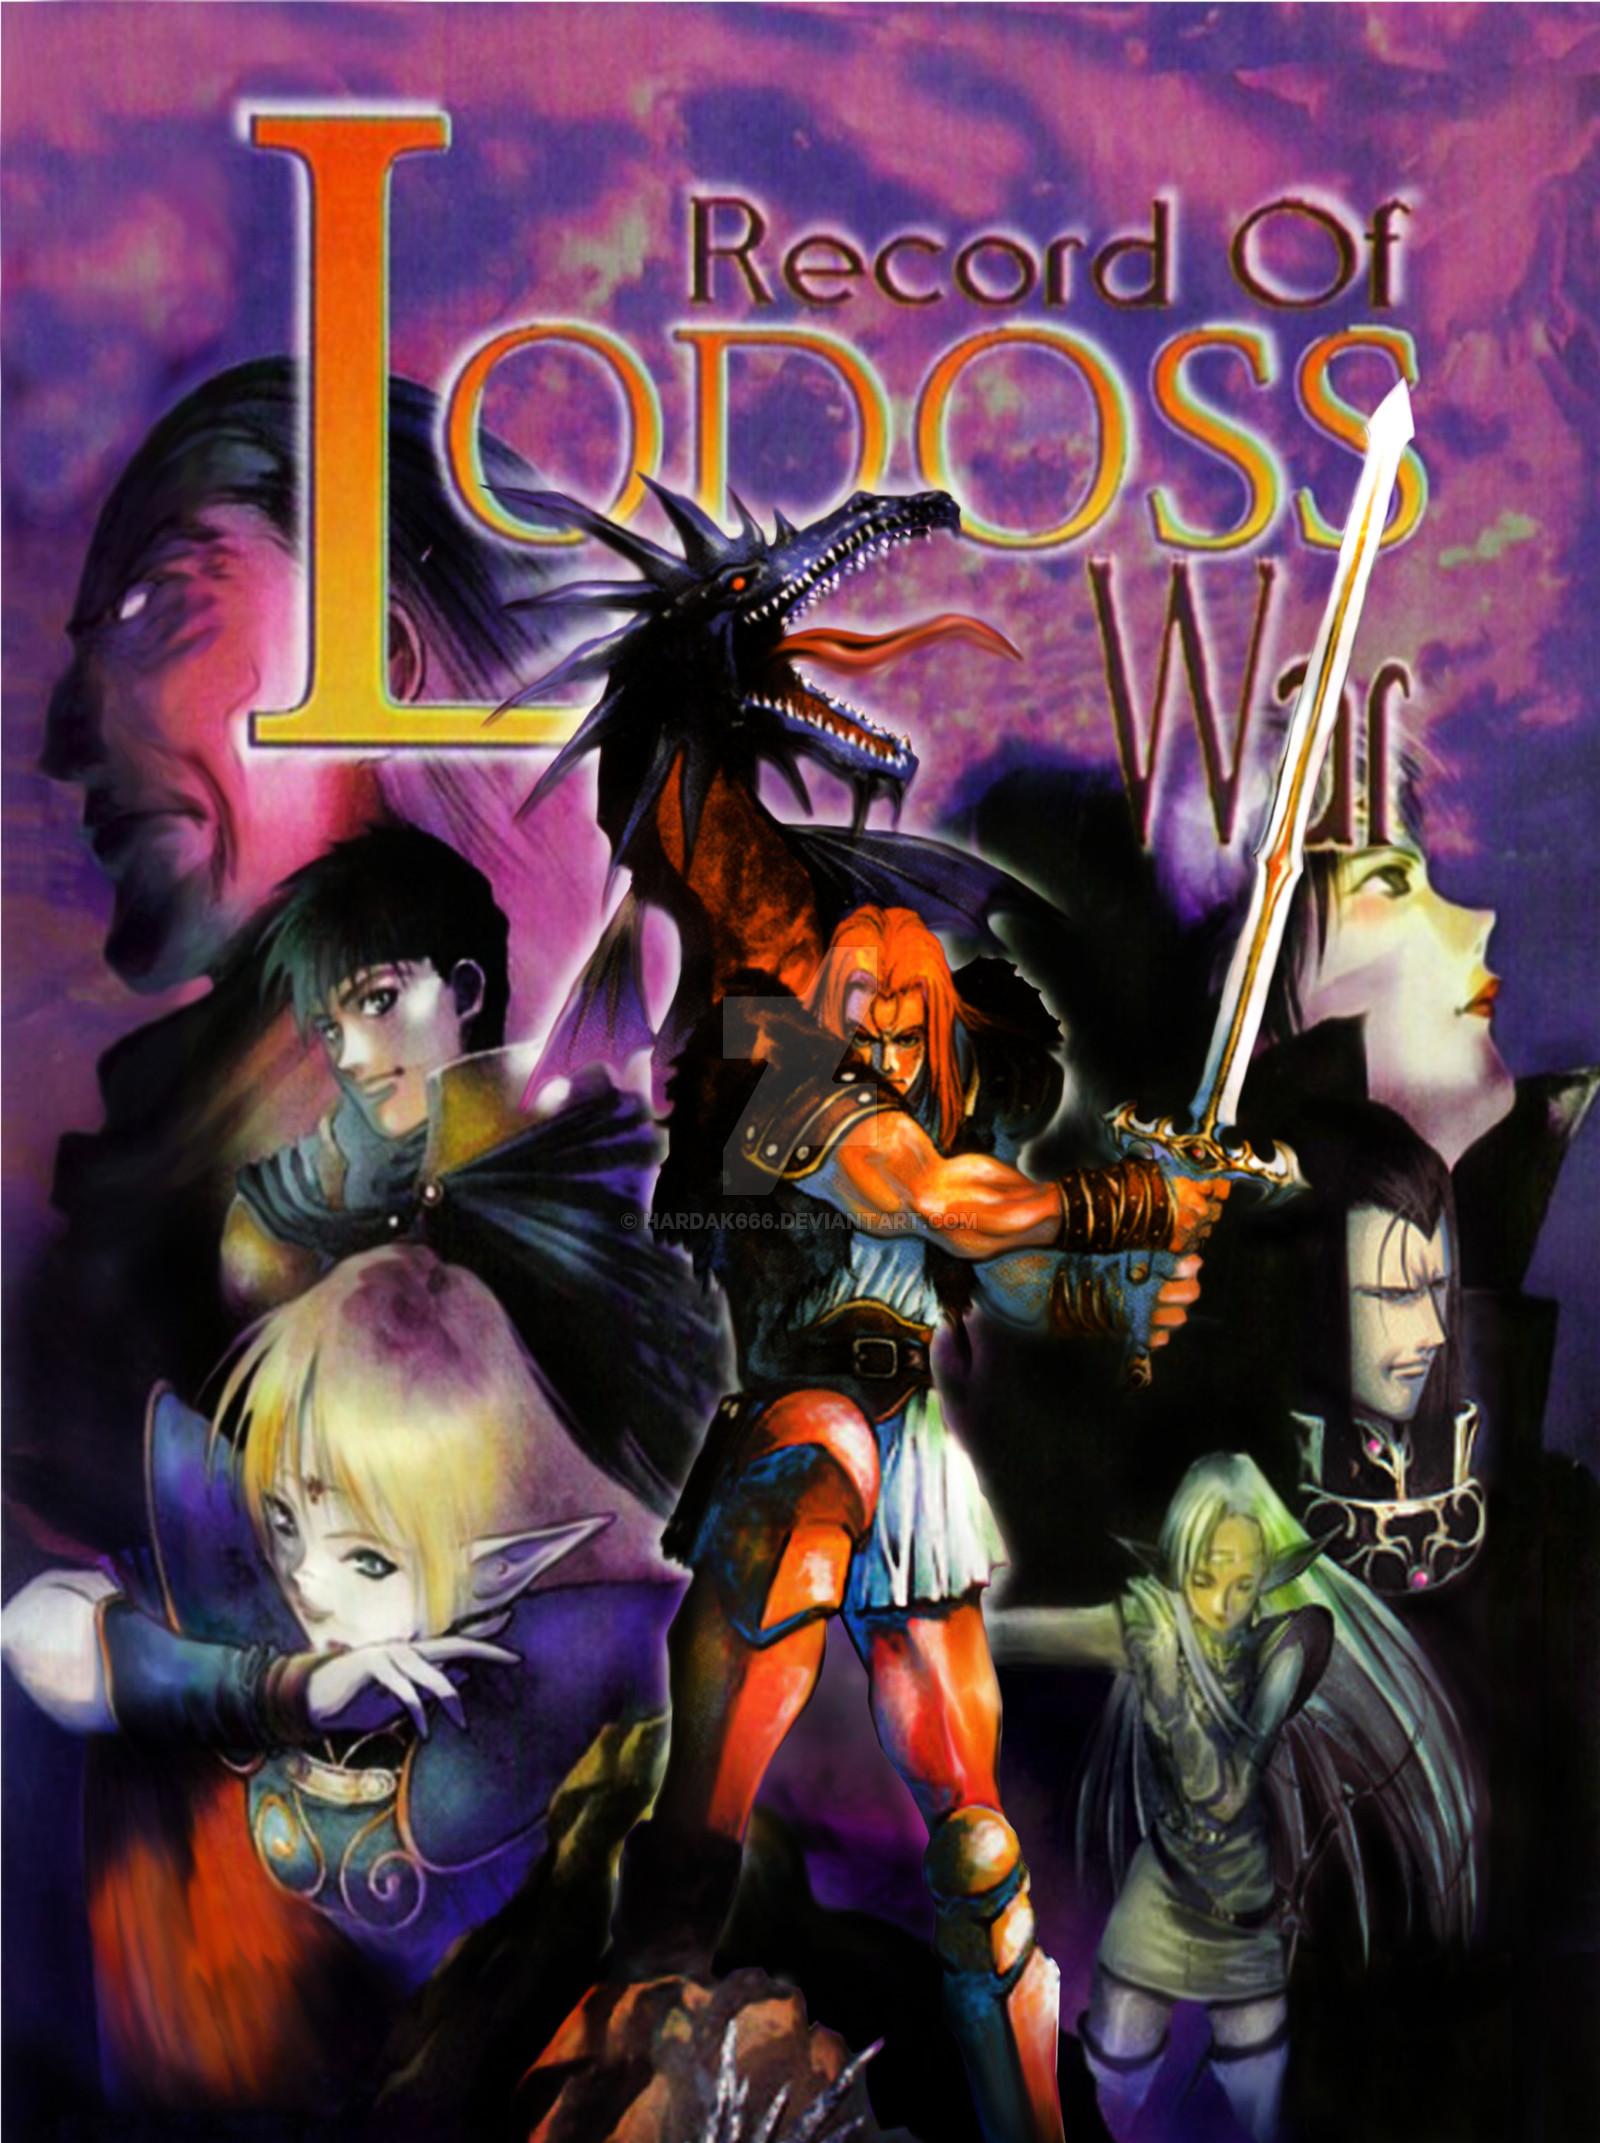 … Record of Lodoss War – Sega Dreamcast by Hardak666